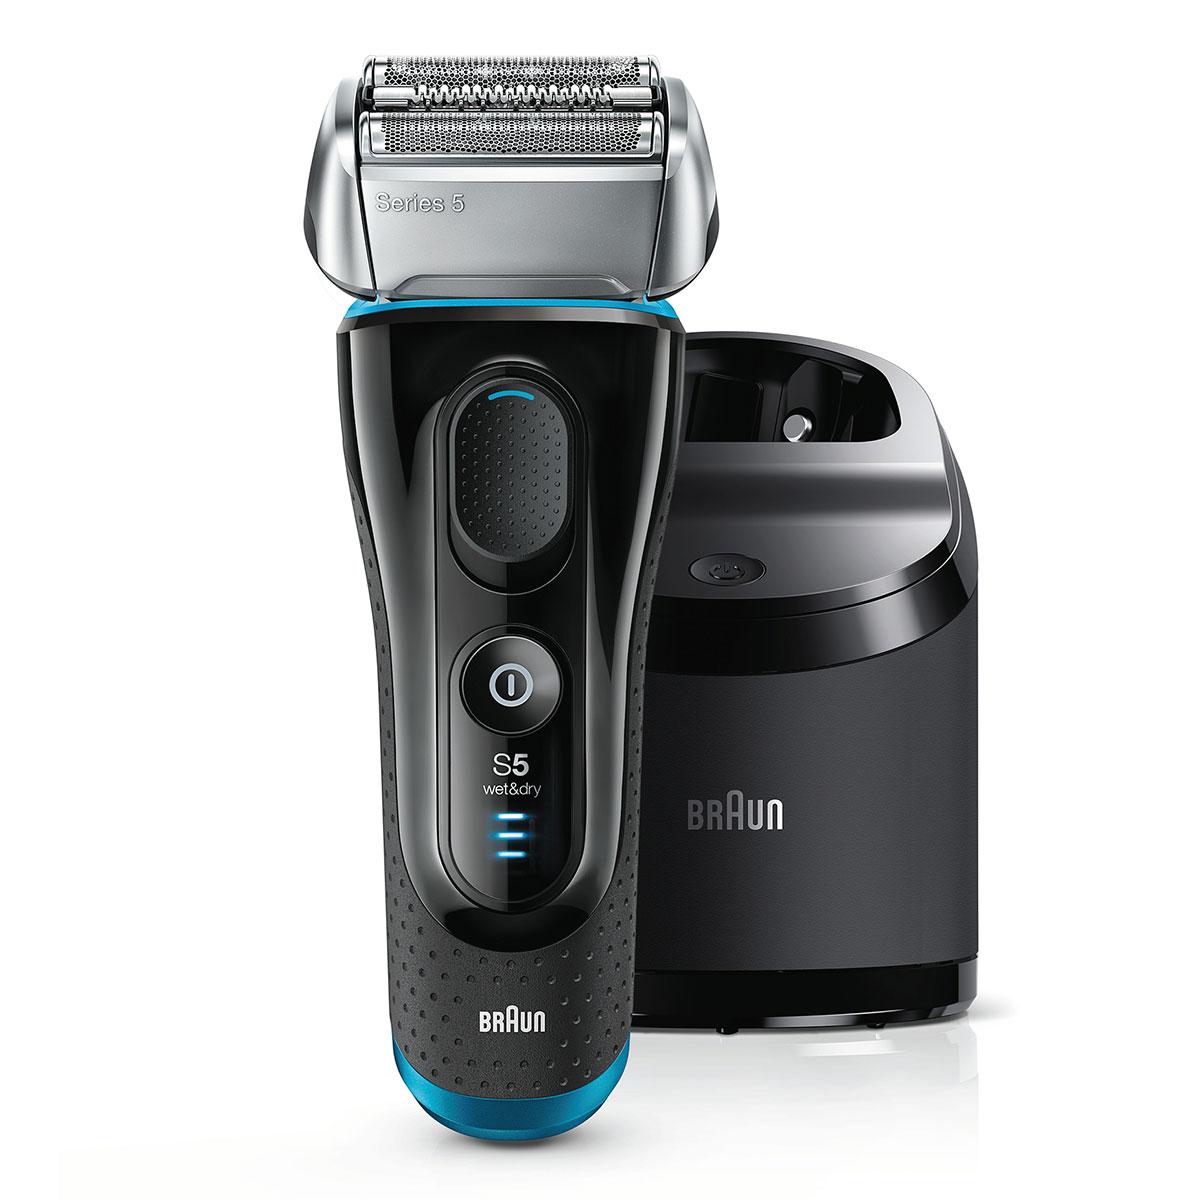 Braun barbermaskine - 5190 CC